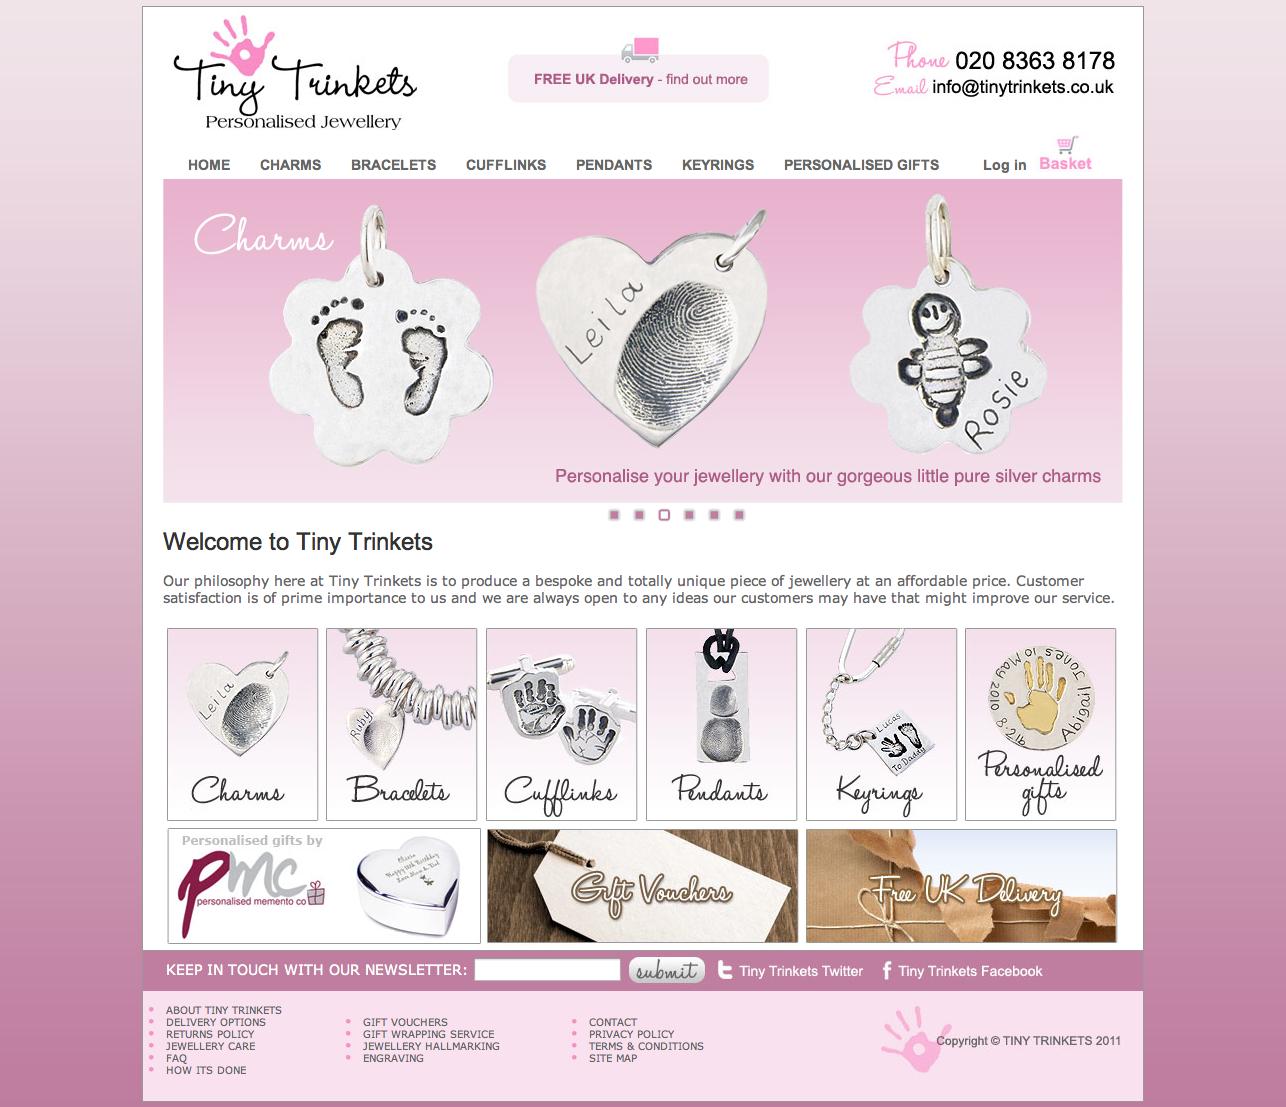 Tiny Trinkets Personalised Jewellery